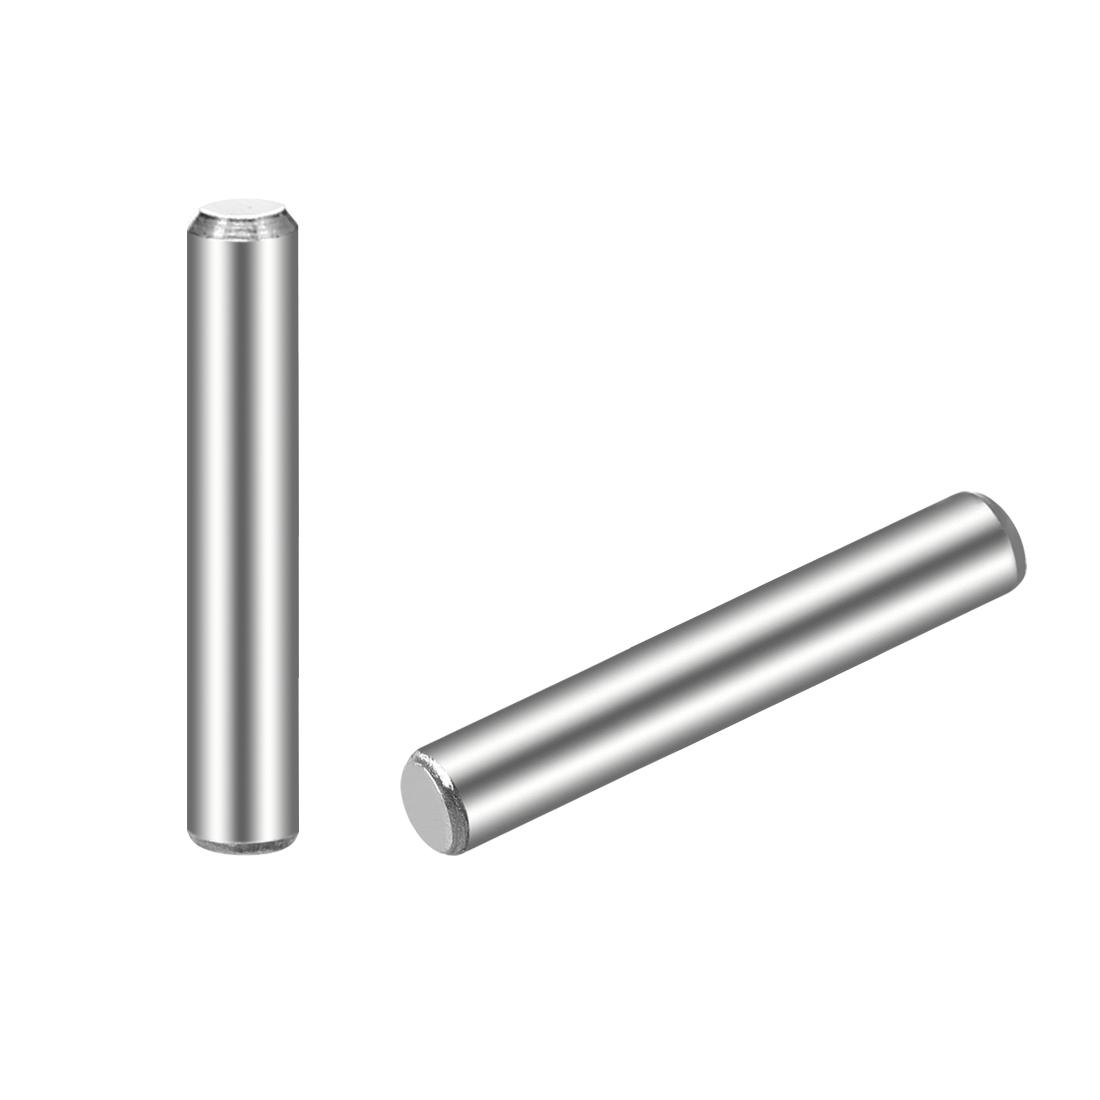 100Pcs 3mm x 18mm Dowel Pin 304 Stainless Steel Shelf Support Pin Fasten